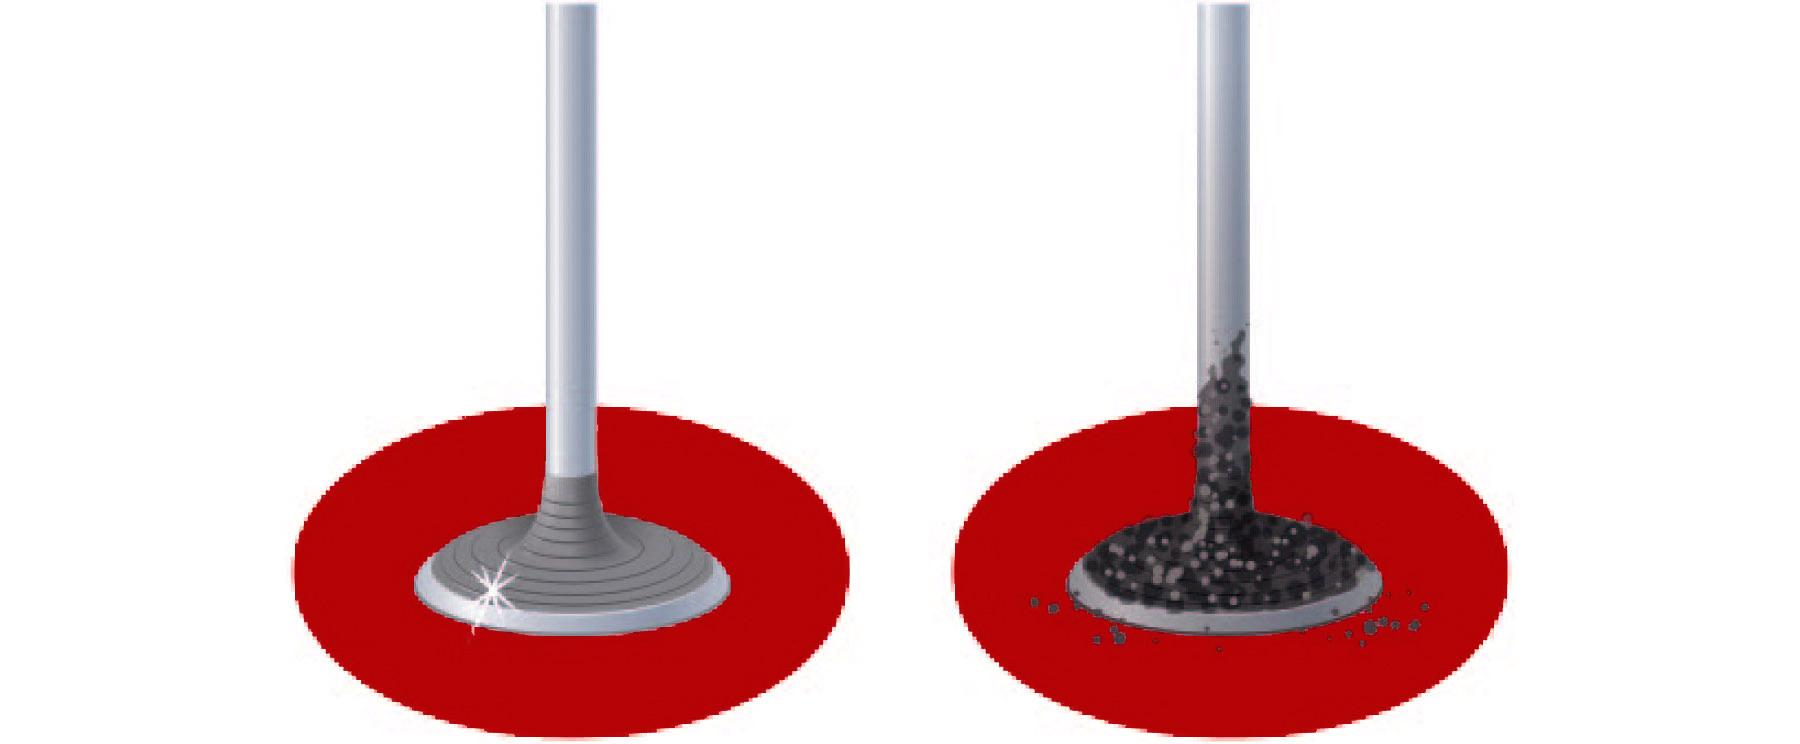 Dirty valves vs. clean valves.